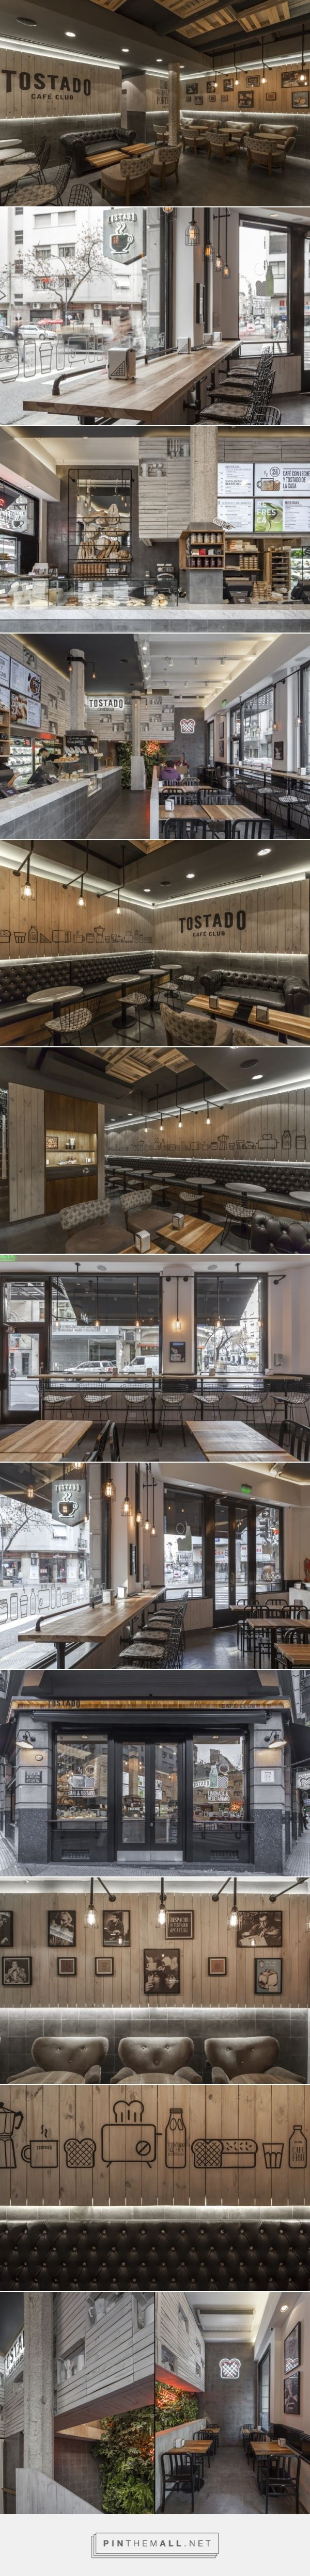 Tostado Cafe Club by Hitzig Militello Arquitectos, Buenos Aires – Argentina » Retail Design Blog - created on 2015-11-02 14:17:38